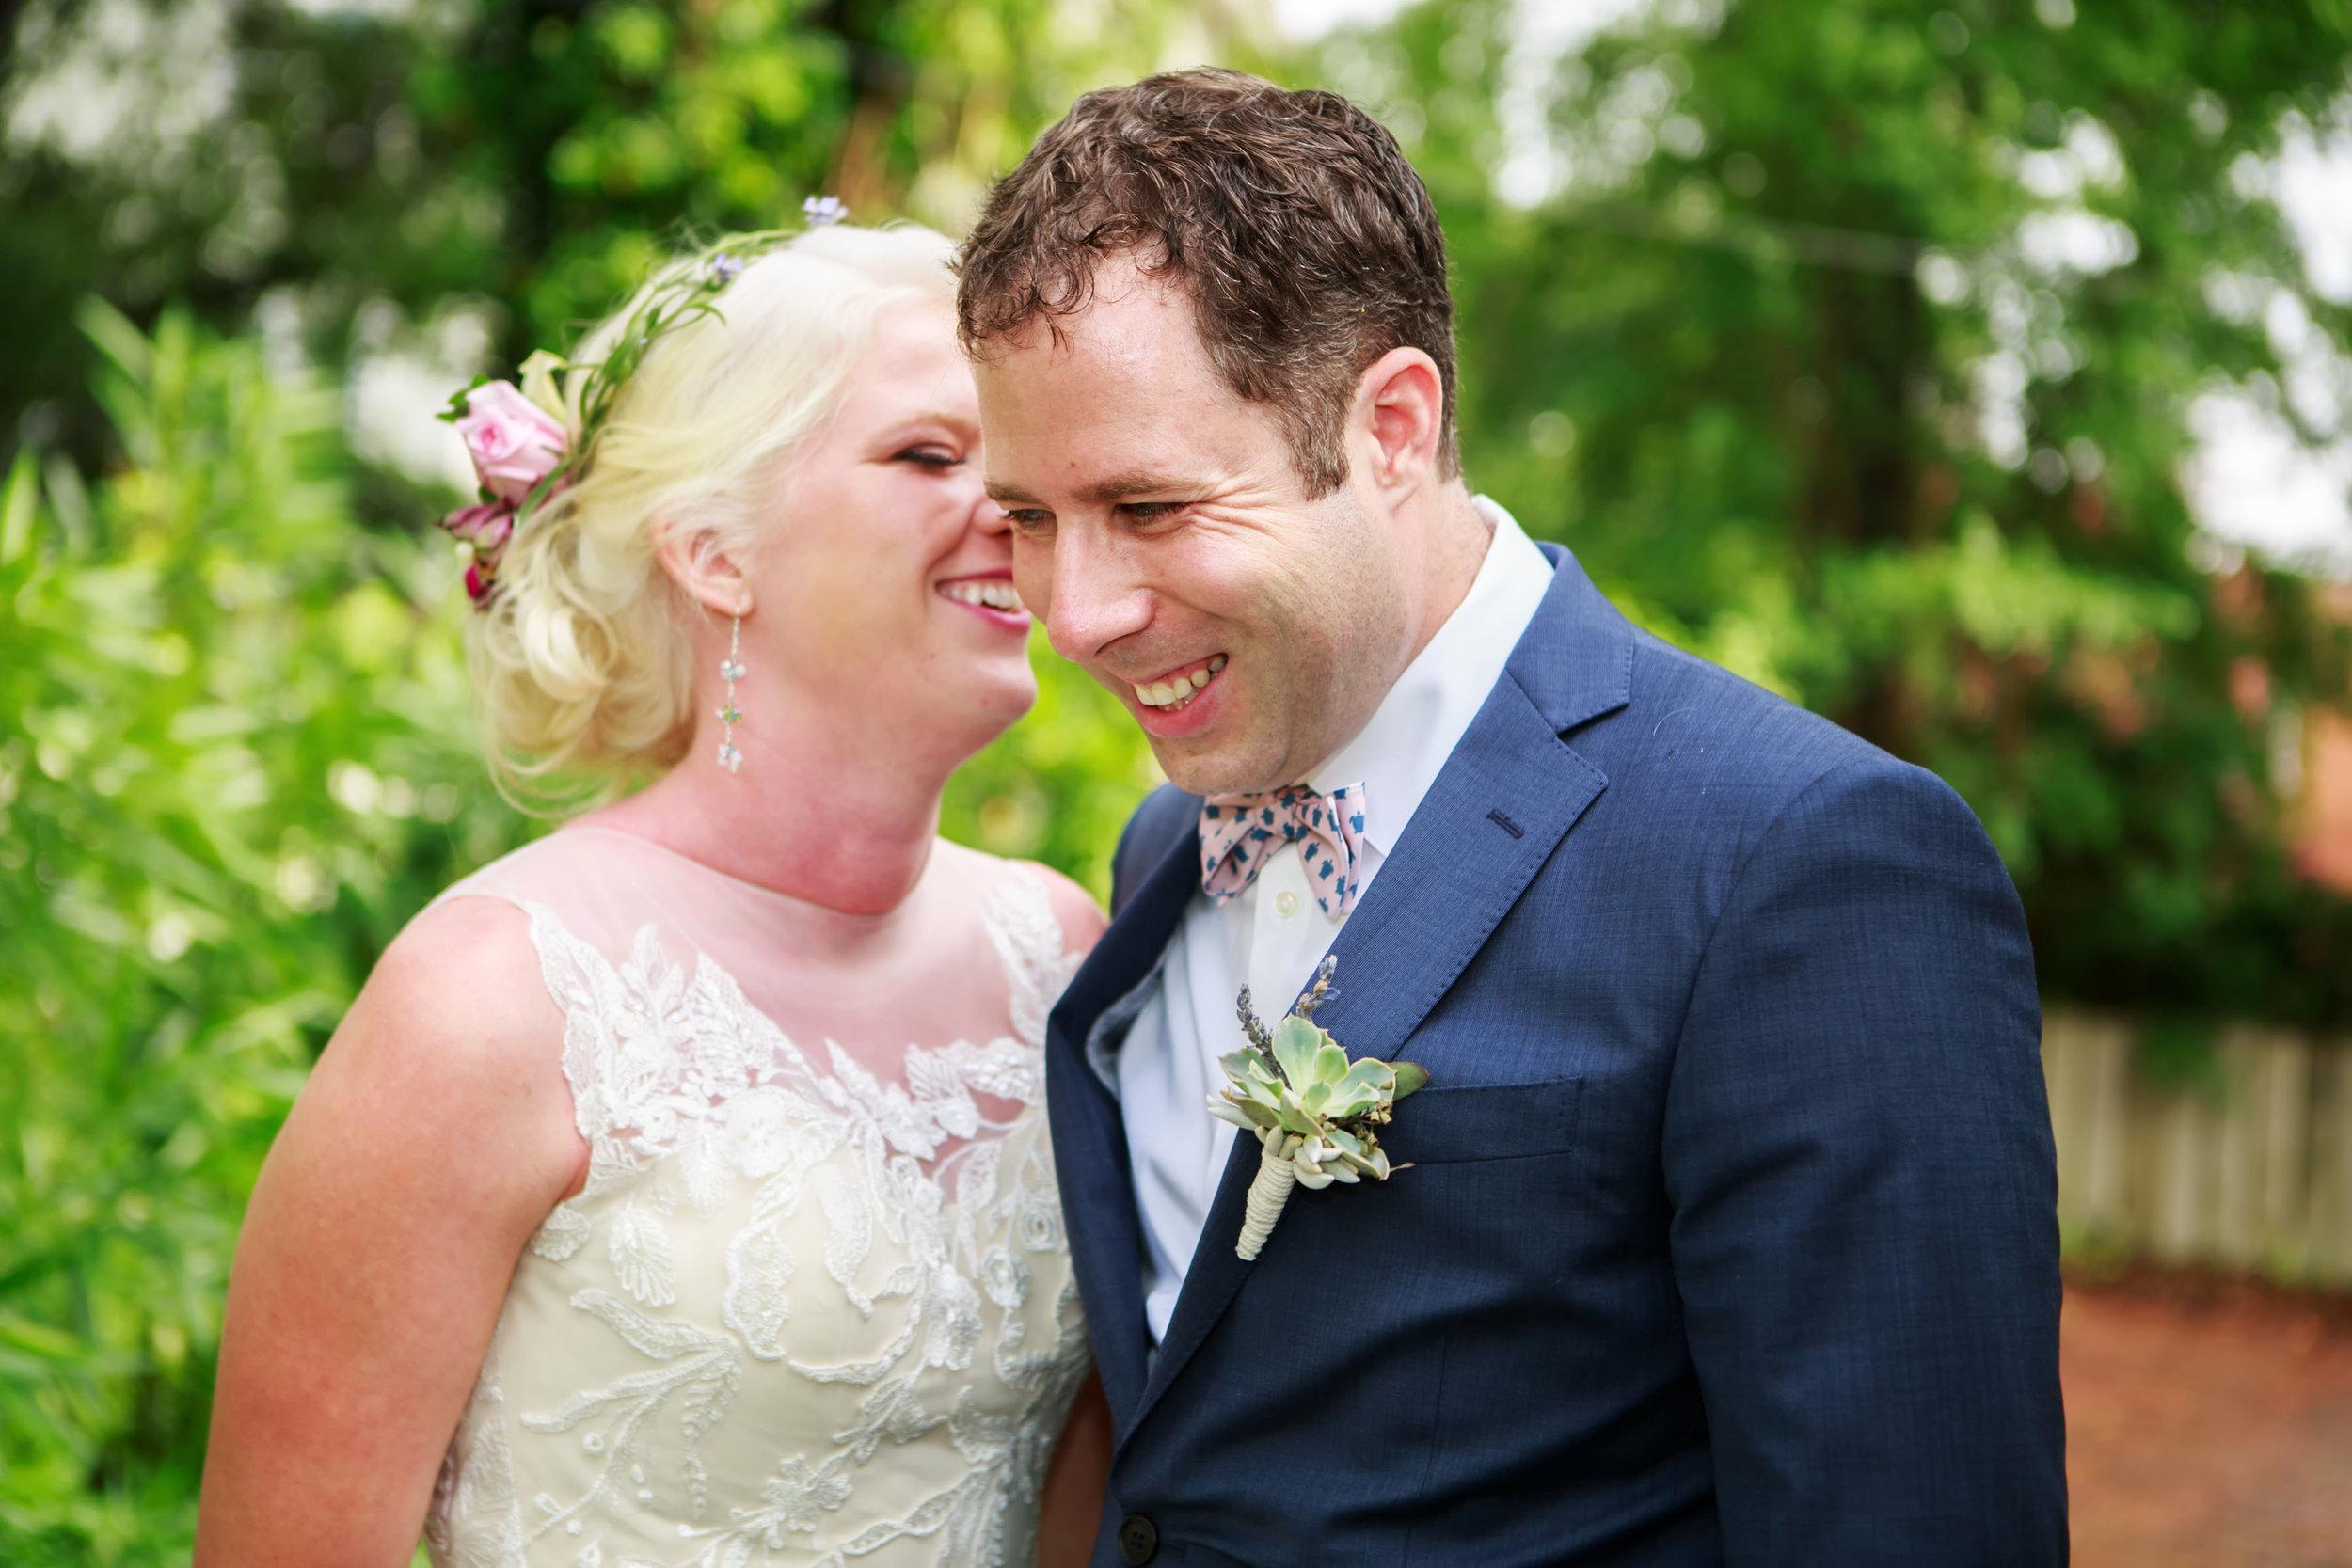 128-South-Wedding-Tiffany-Abruzzo-Photography-Bride-&-Groom-18.jpg